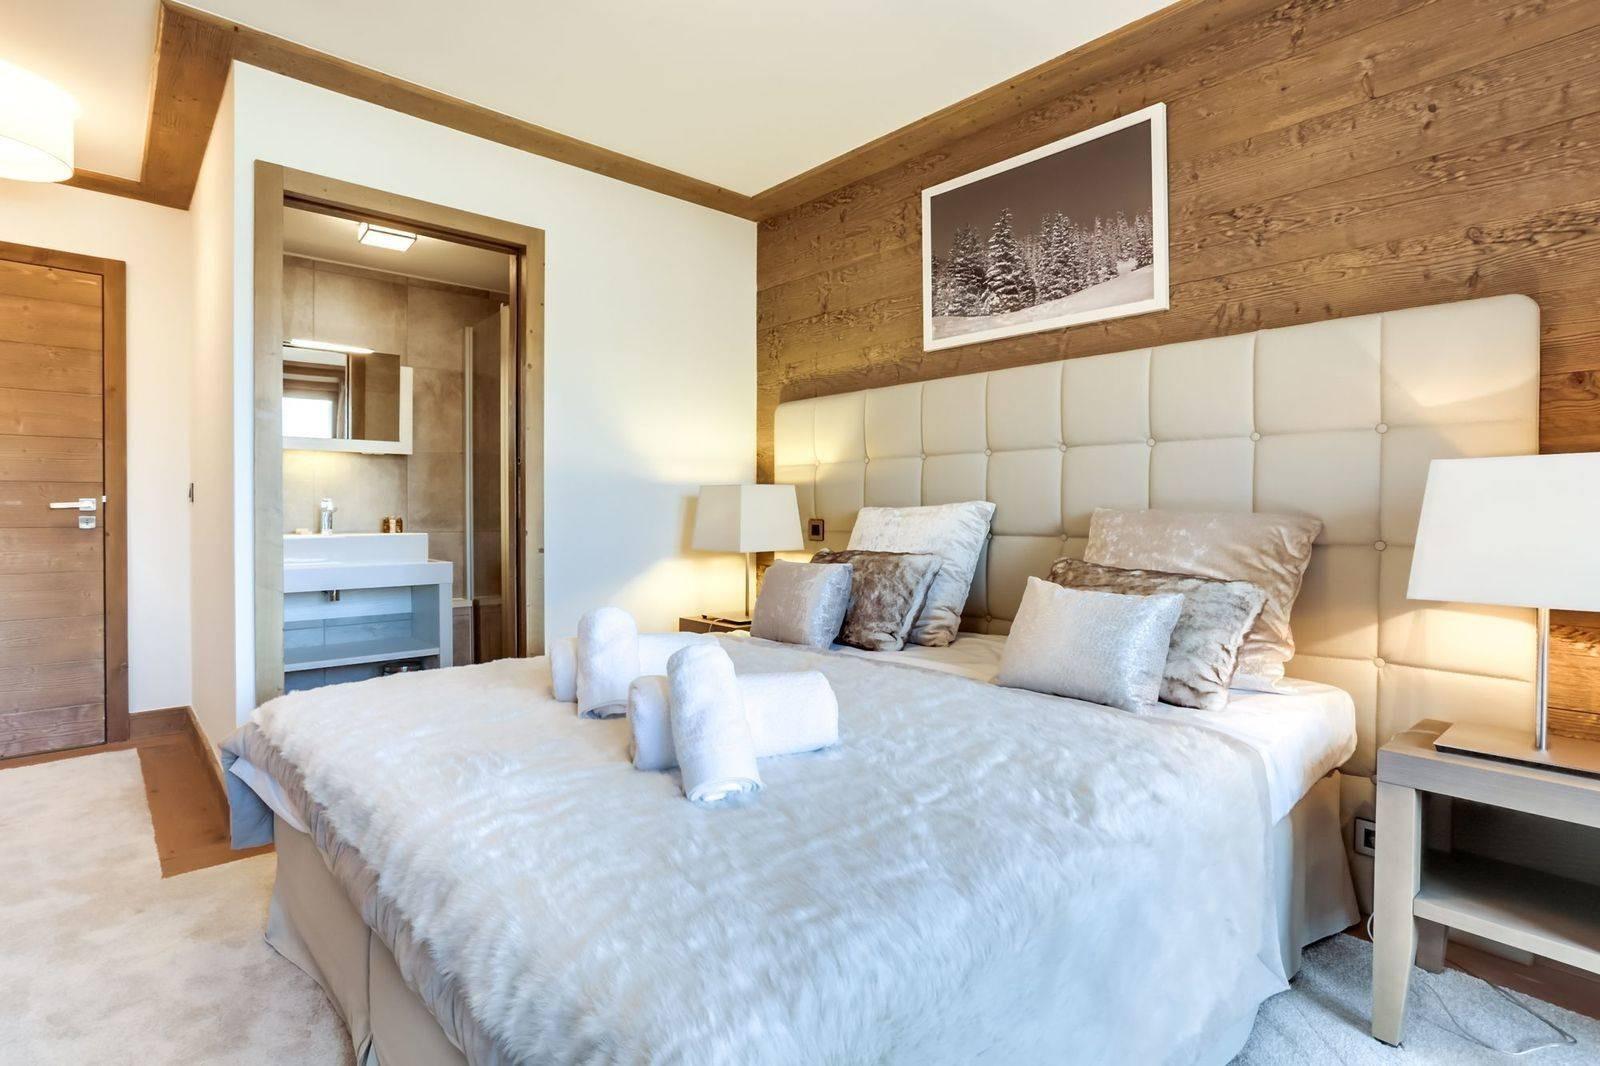 Courchevel 1550 Luxury Rental Appartment Telikia Bedroom 3